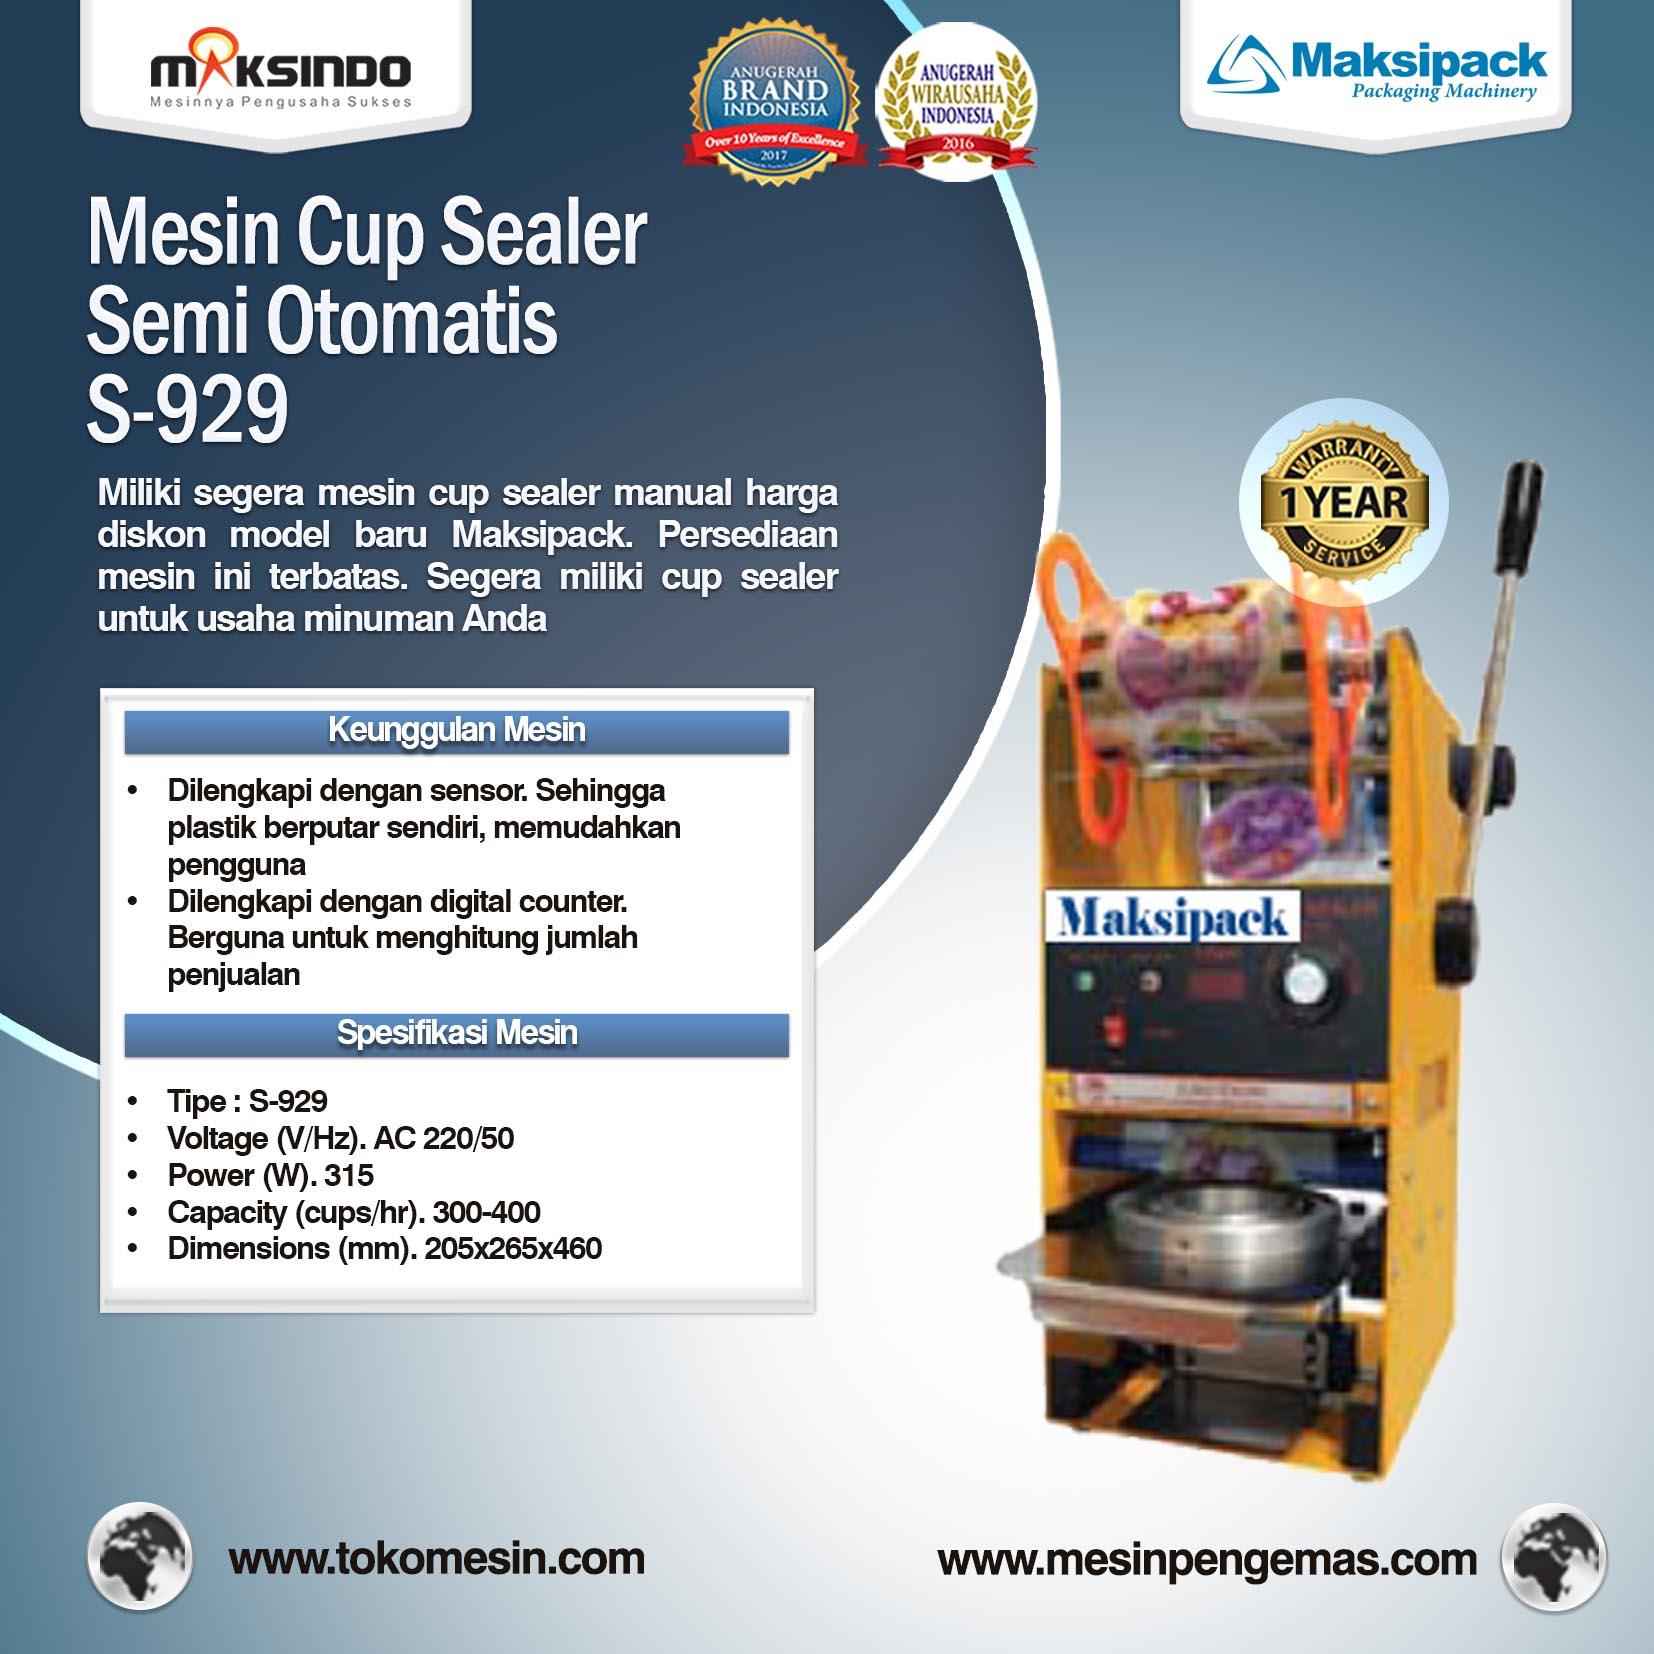 Mesin Cup Sealer Semi Otomatis S-929